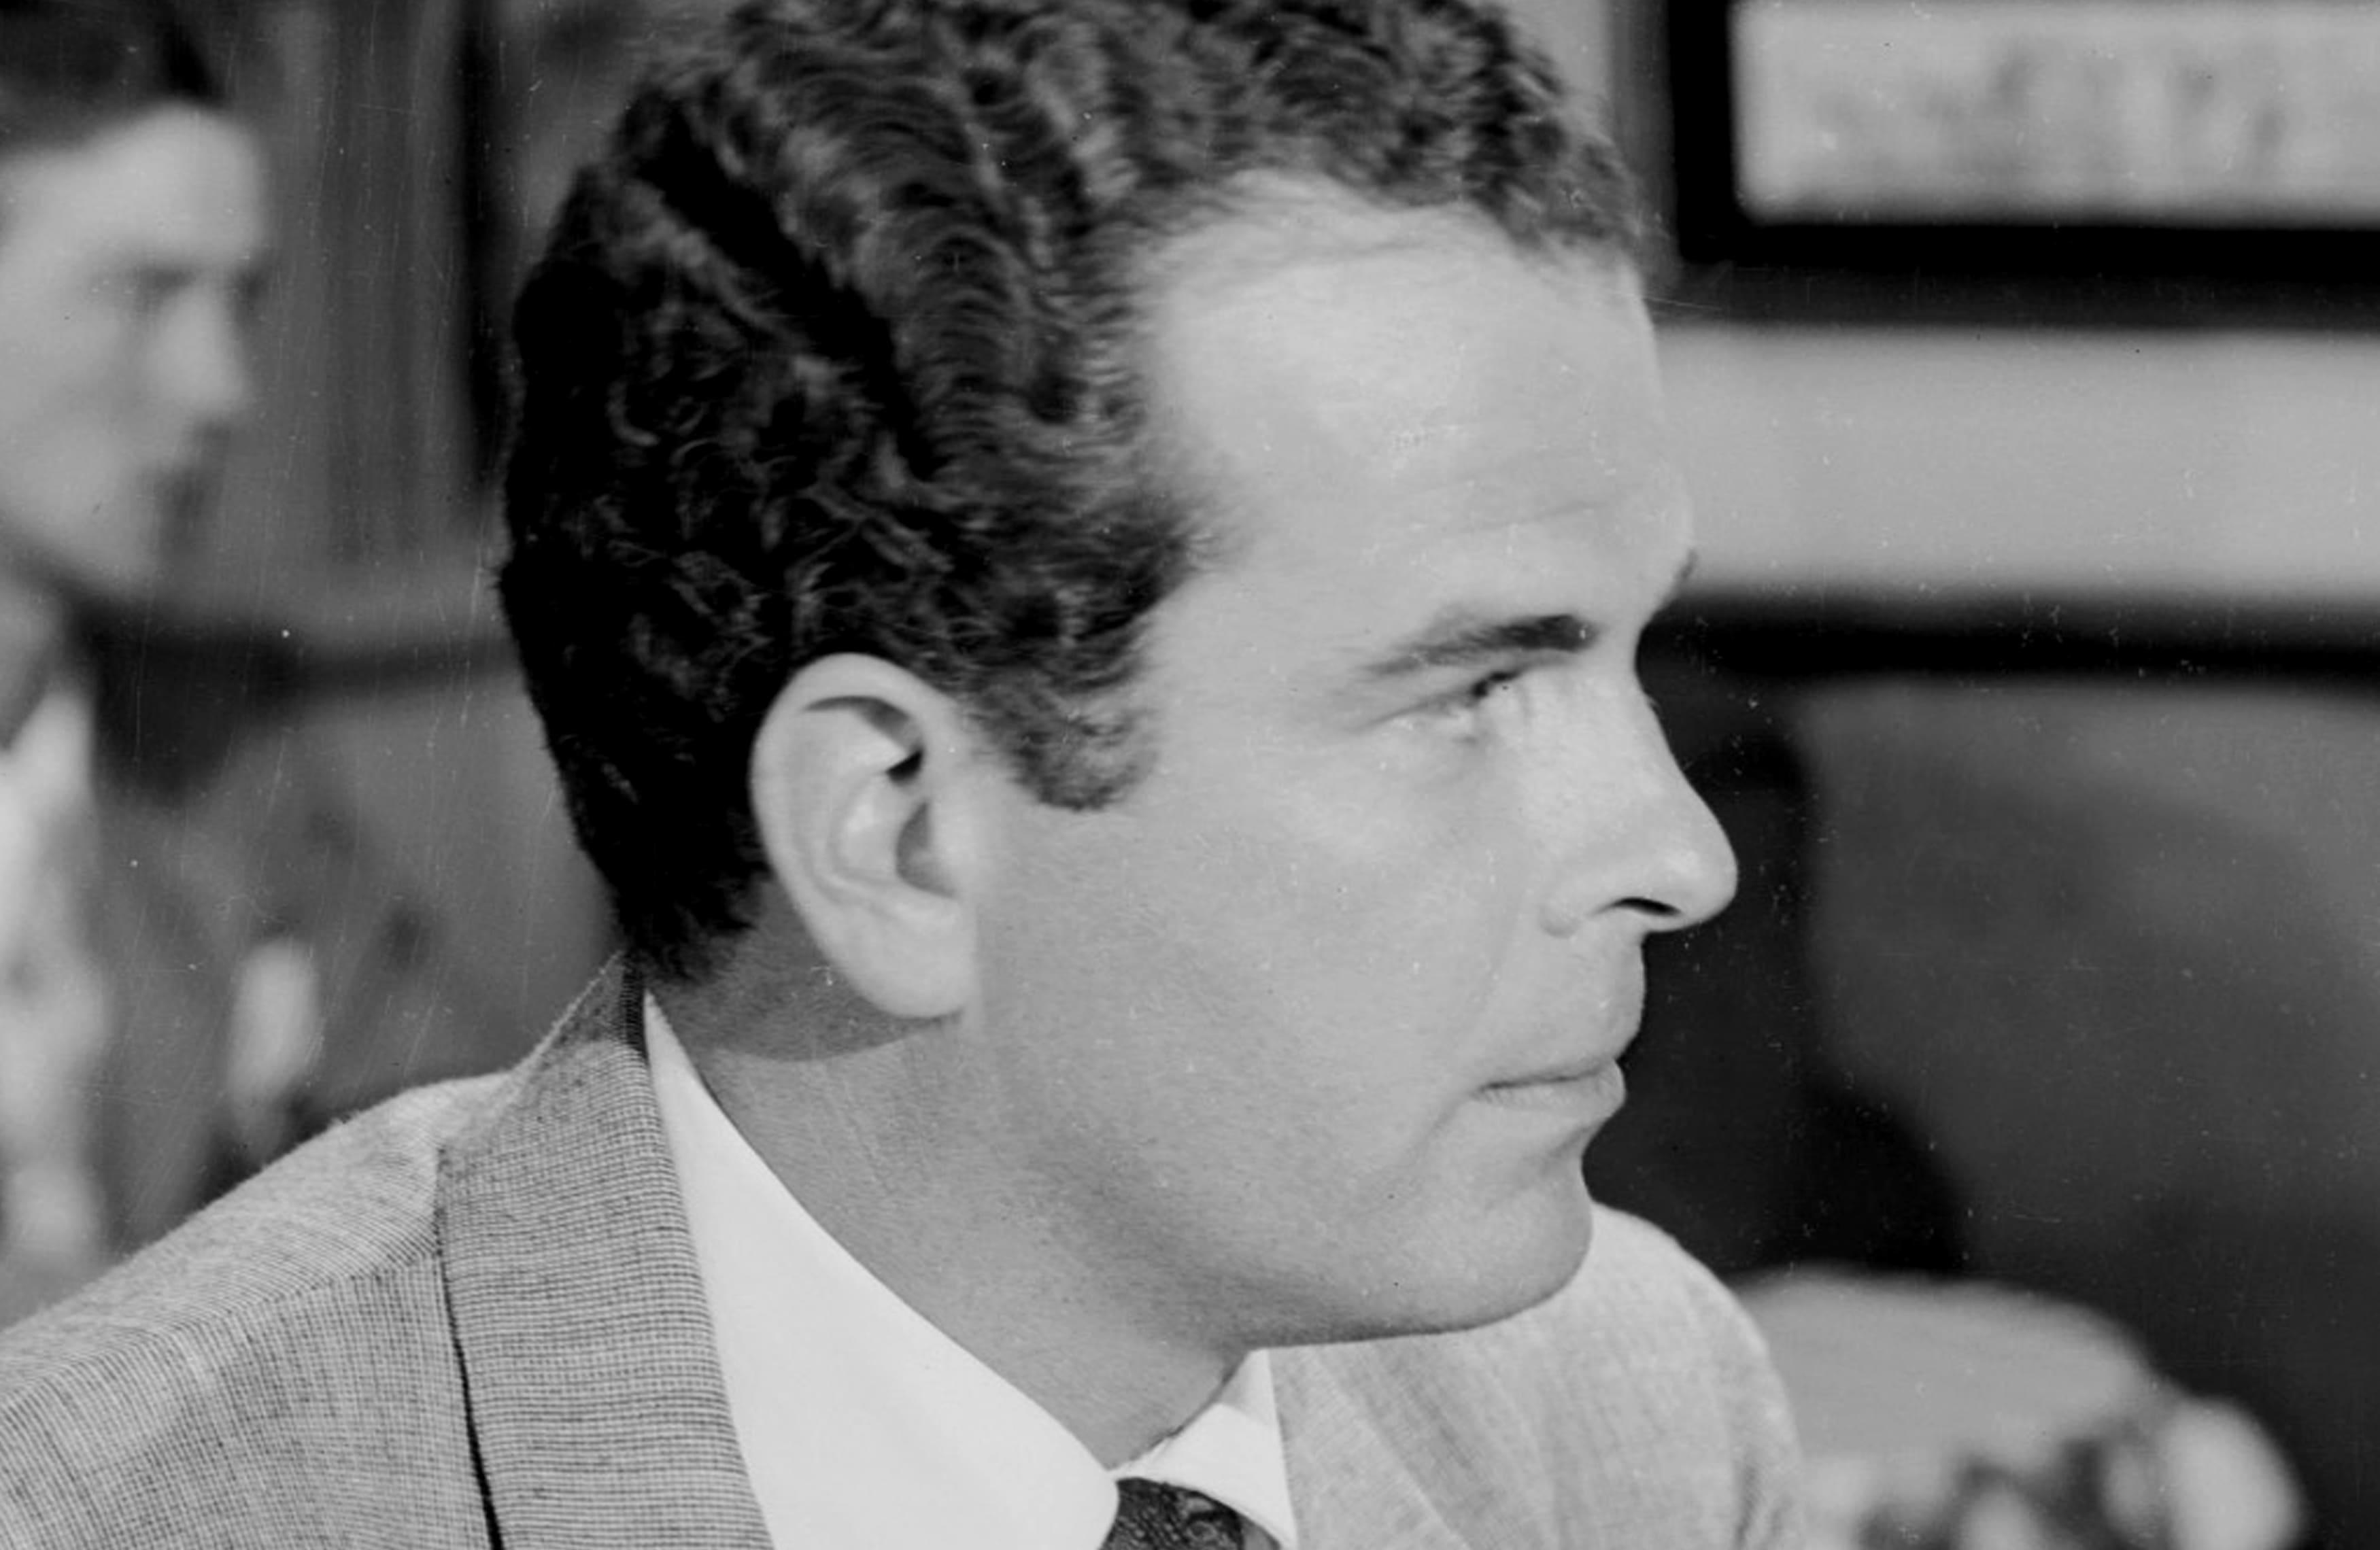 Douglas Kennedy